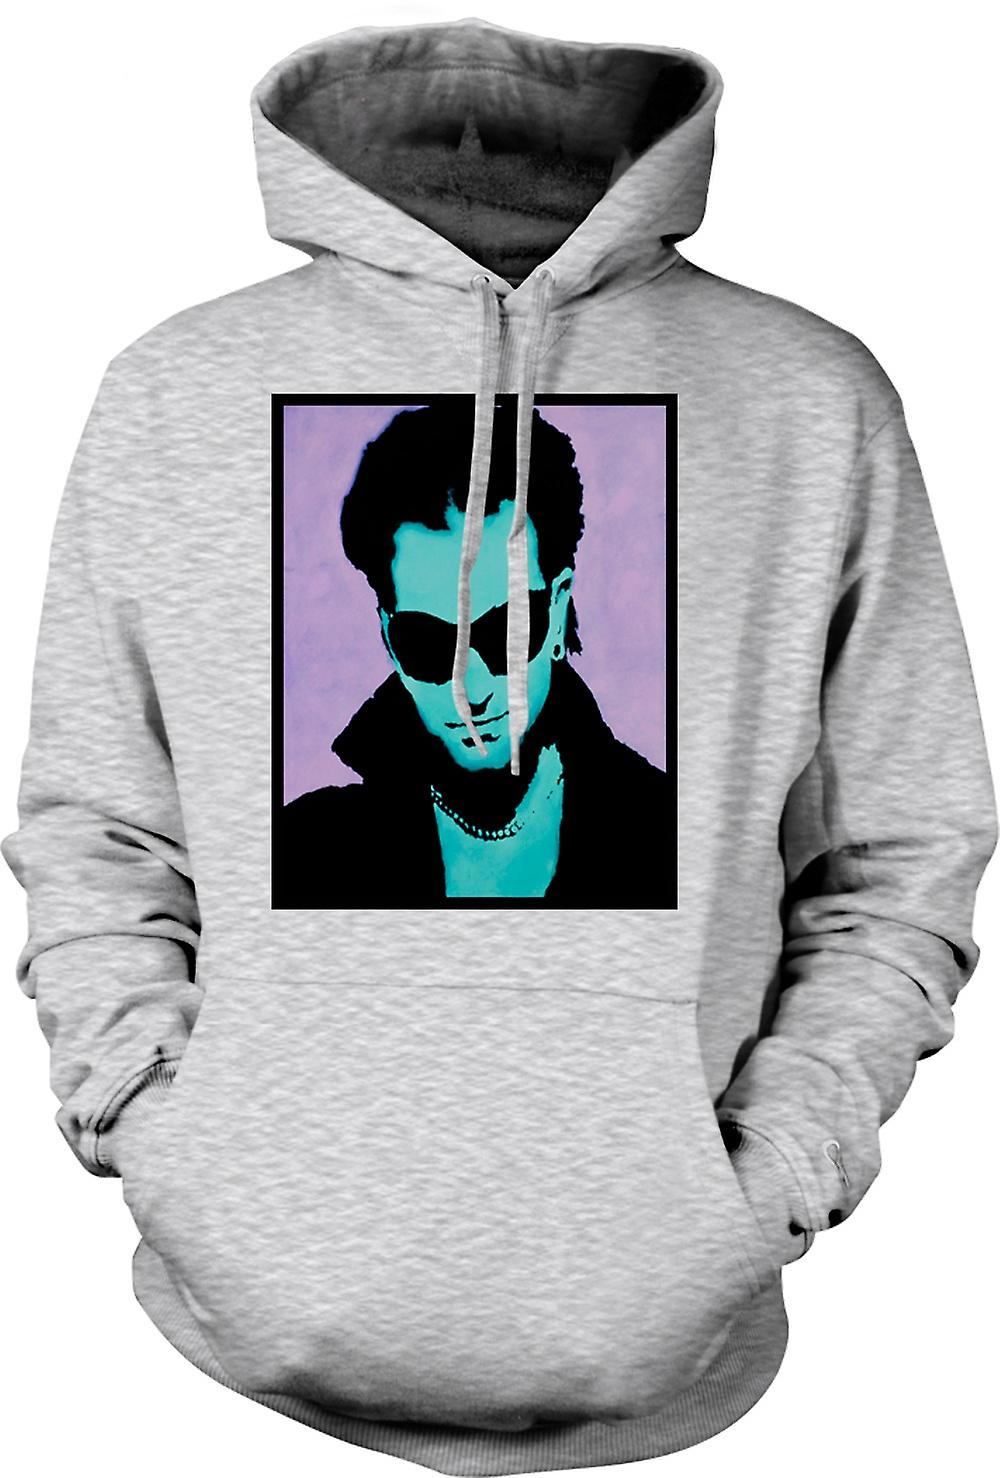 Mens Hoodie - U2 - Bono - Pop Art